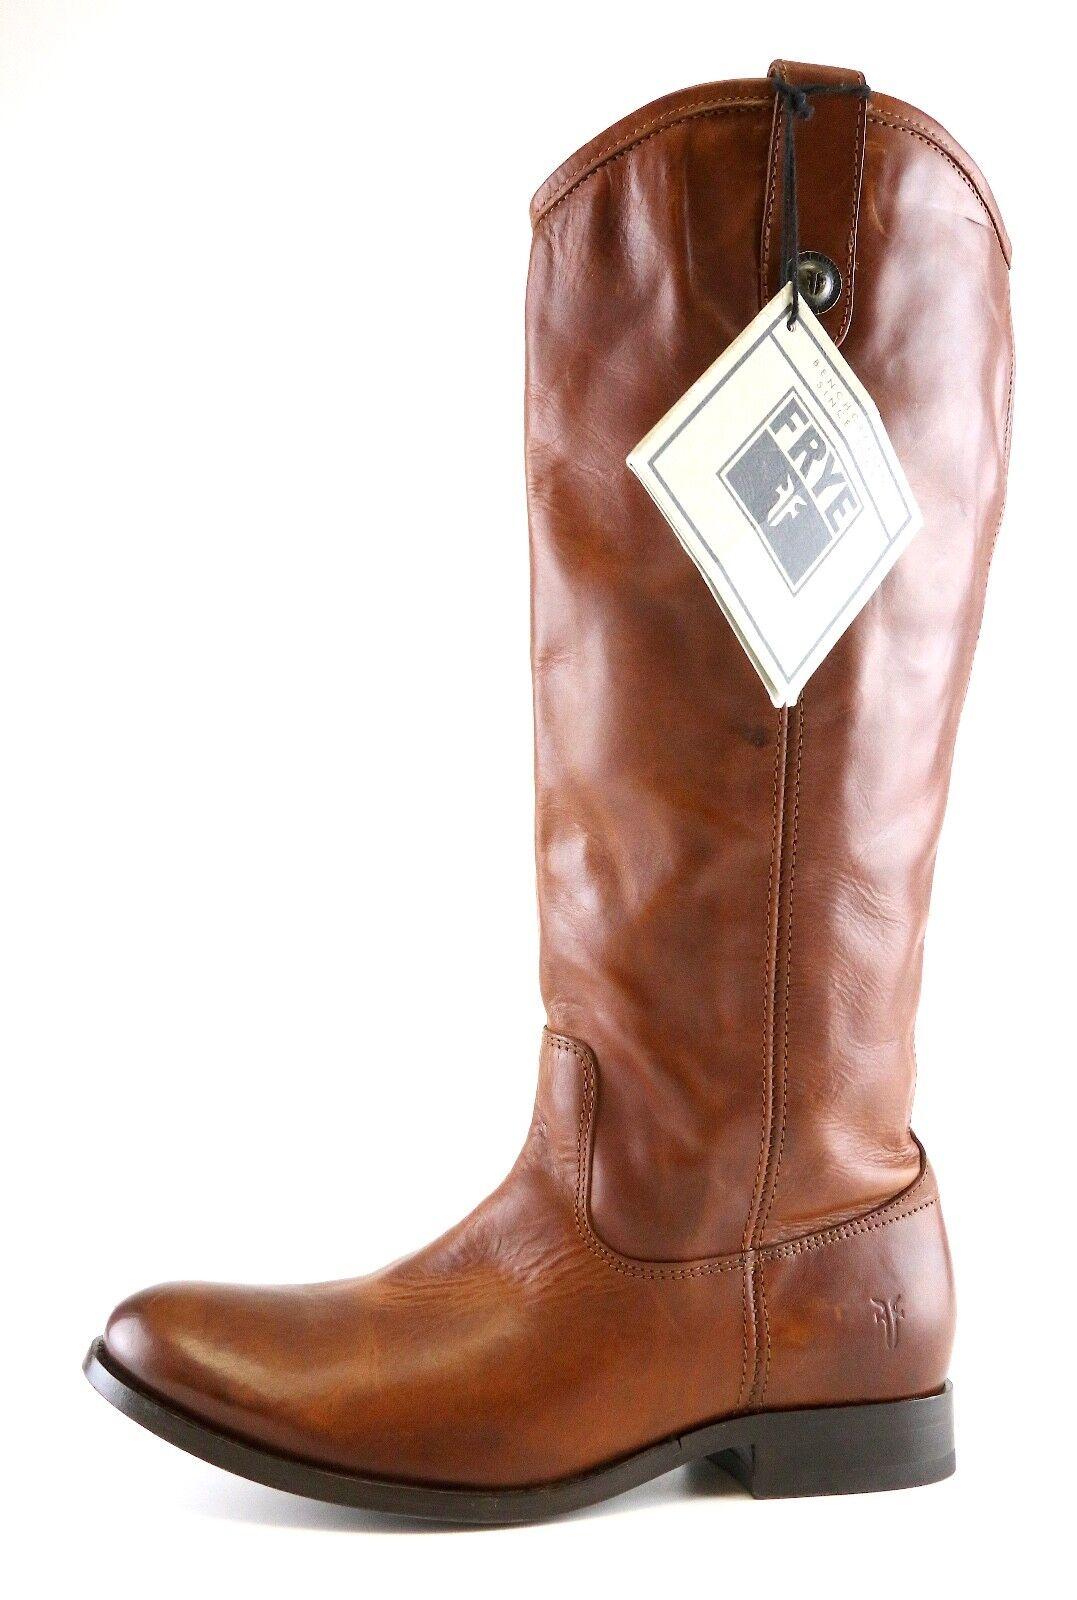 Frye Melissa Button Leather Riding Boot Brown Women Sz 7.5 B 6727 *